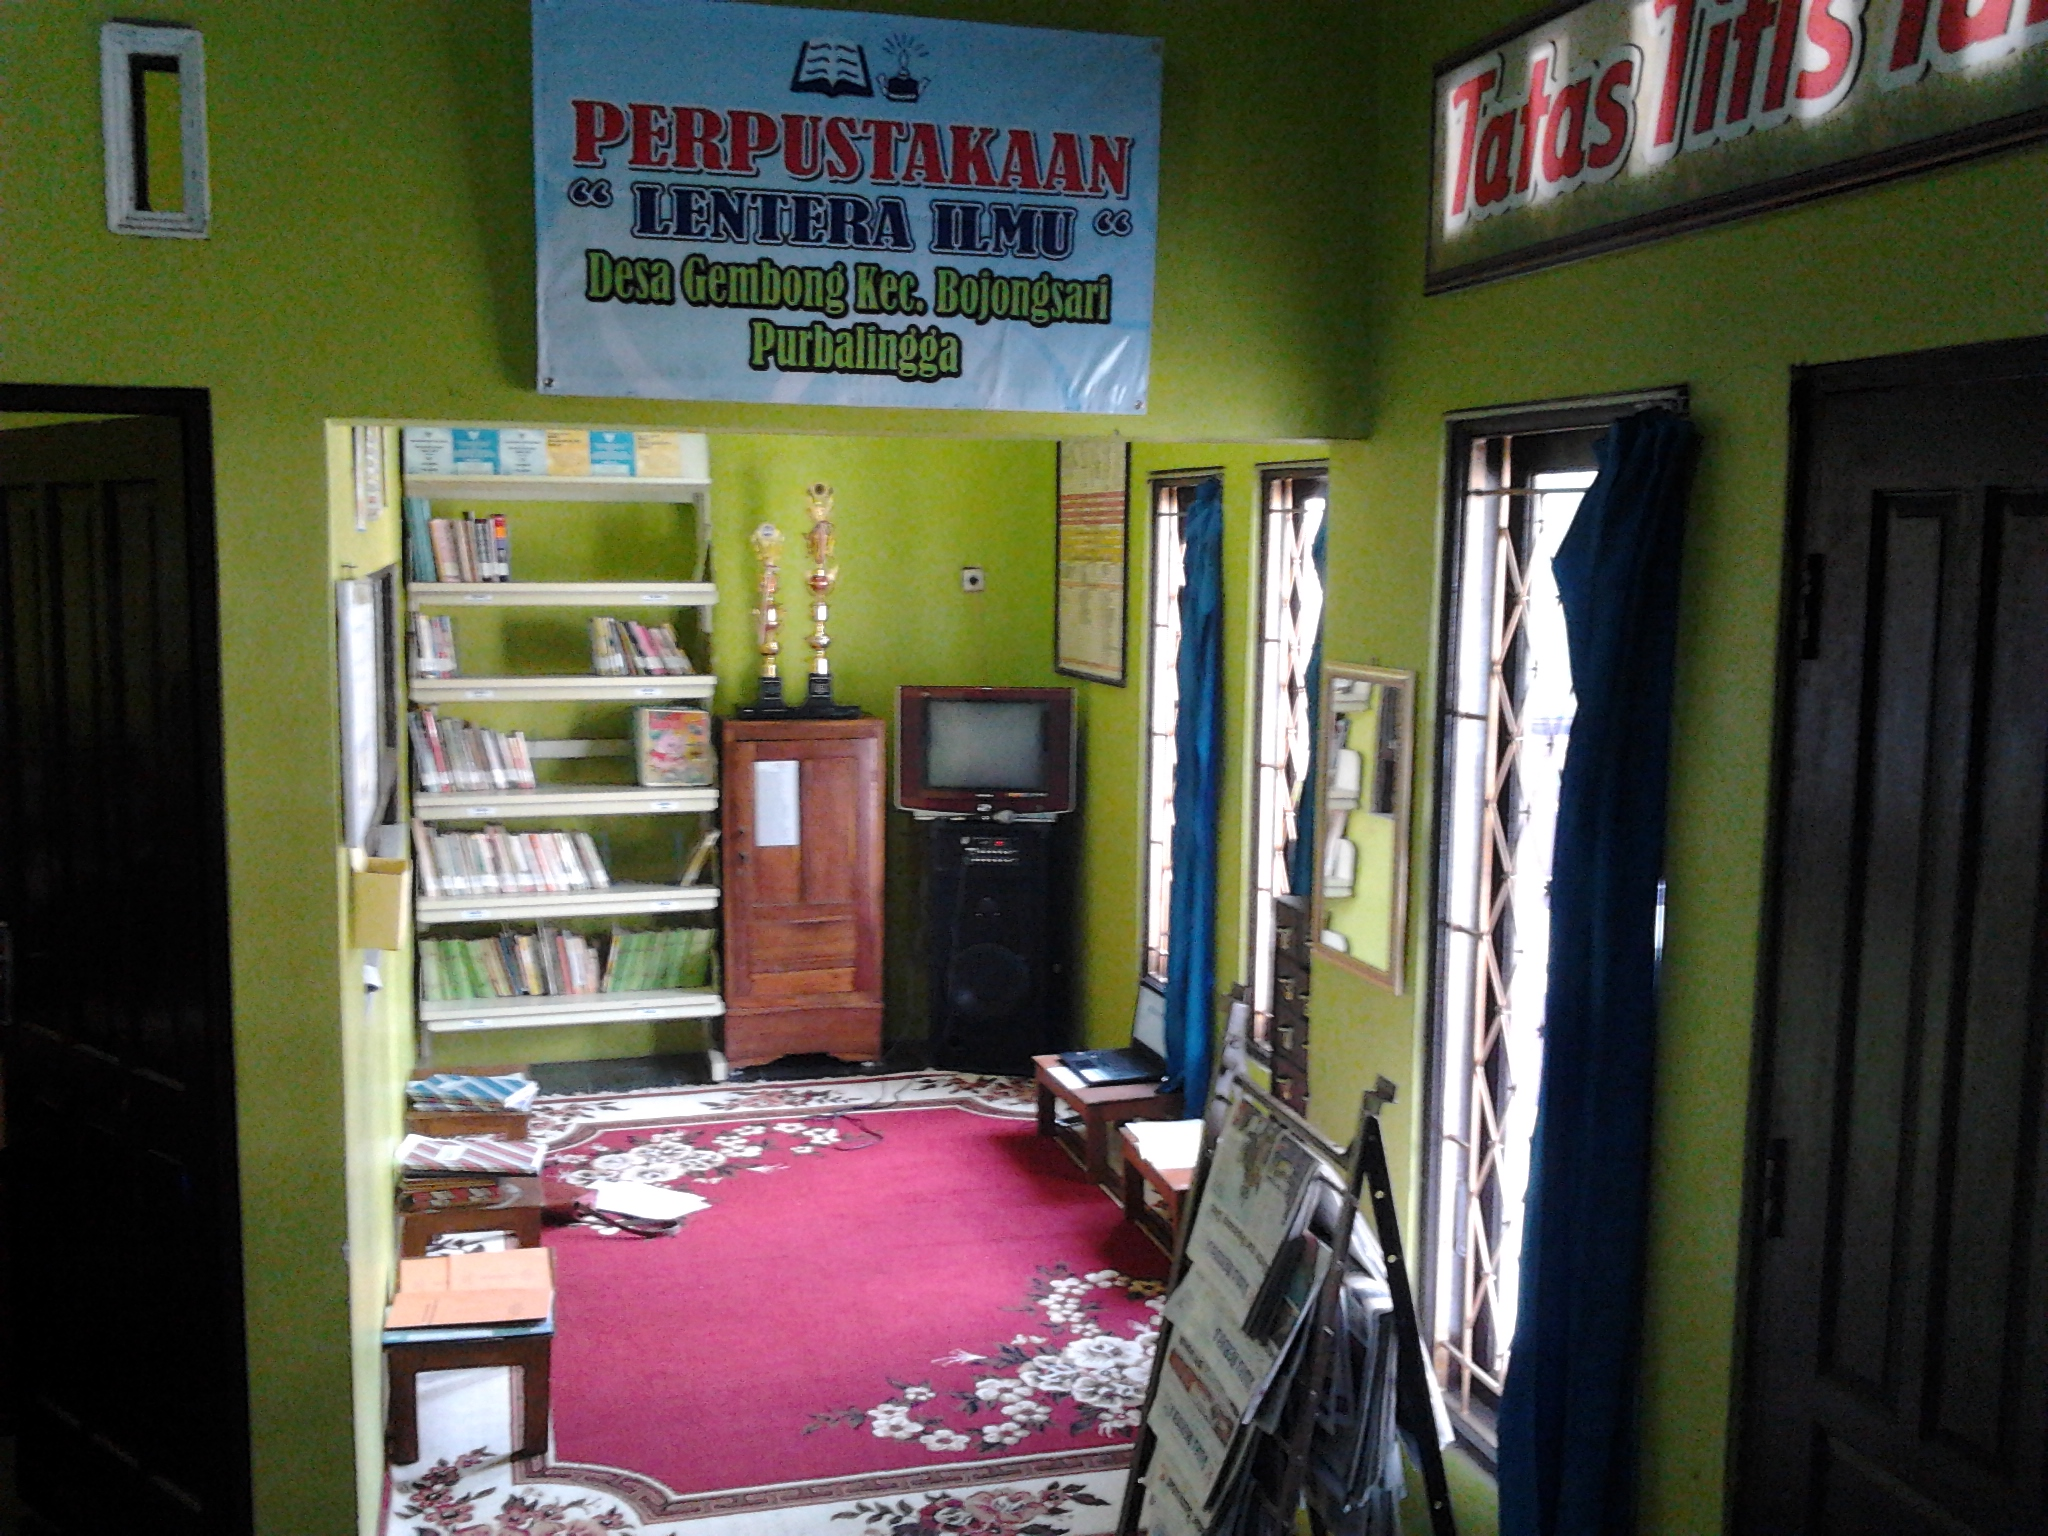 Perpustakaan Lentera Ilmu Desa Gembong,Bersaing Memperebutkan Juara 1 Perpustakaan Tingkat Kabupaten Purbalingga